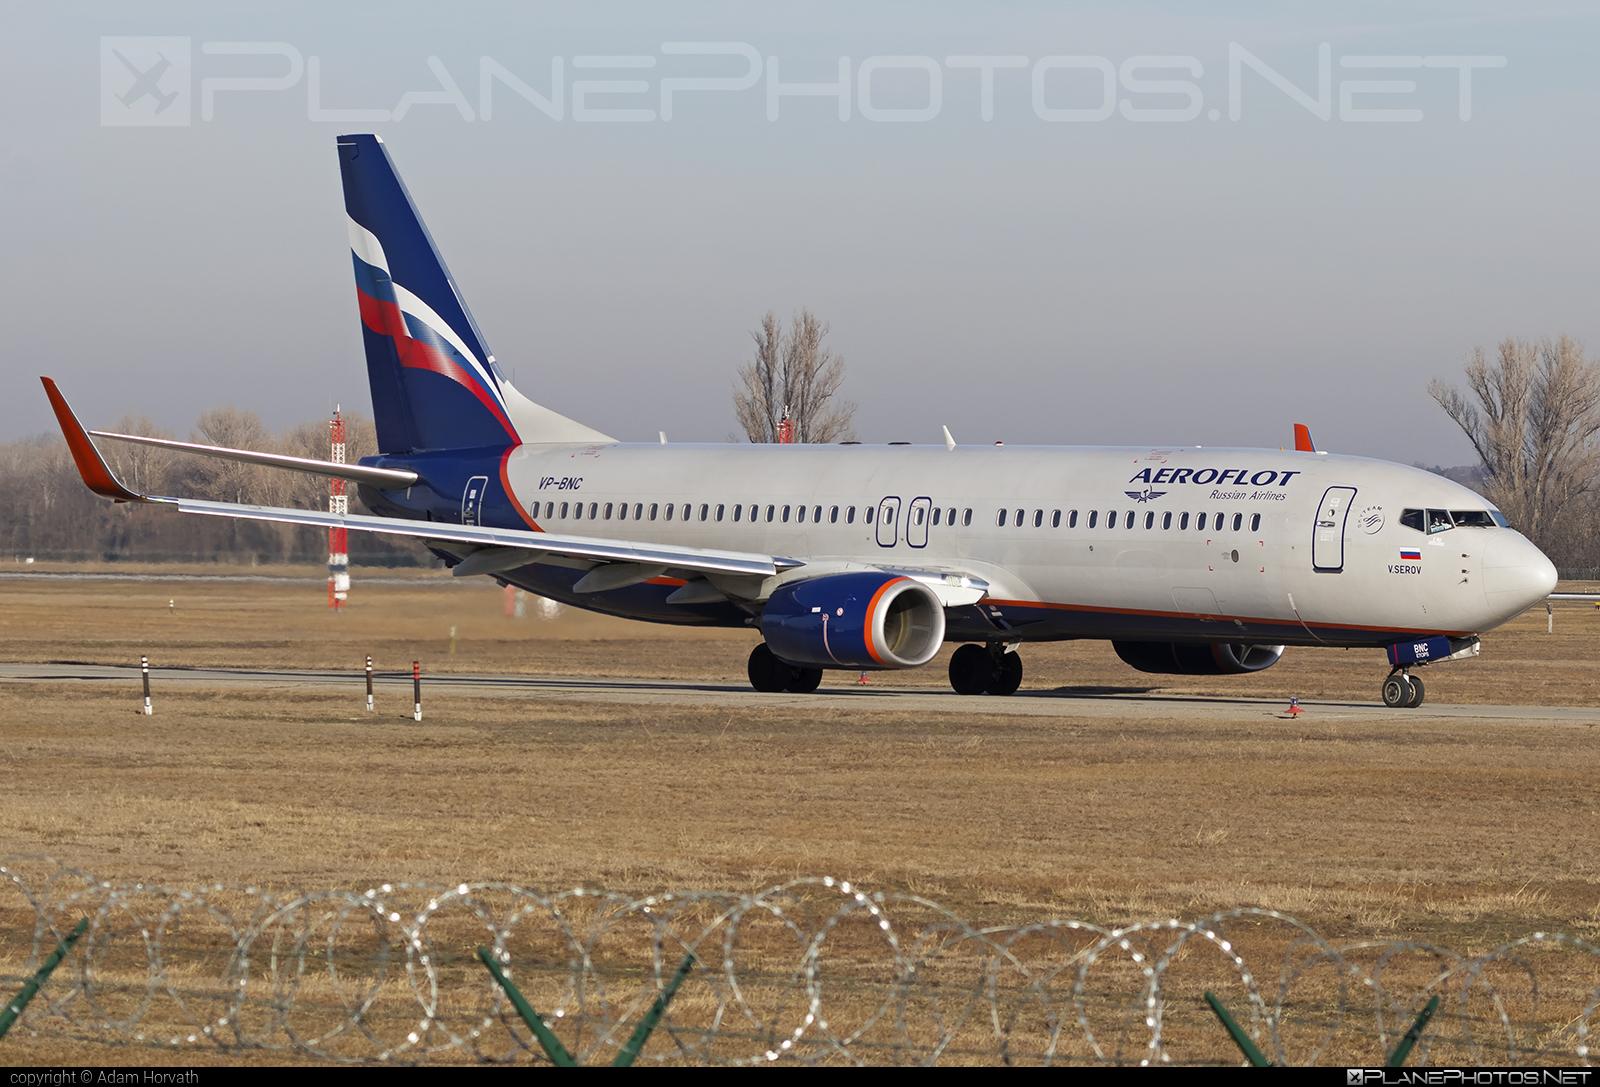 Boeing 737-800 - VP-BNC operated by Aeroflot #aeroflot #b737 #b737nextgen #b737ng #boeing #boeing737